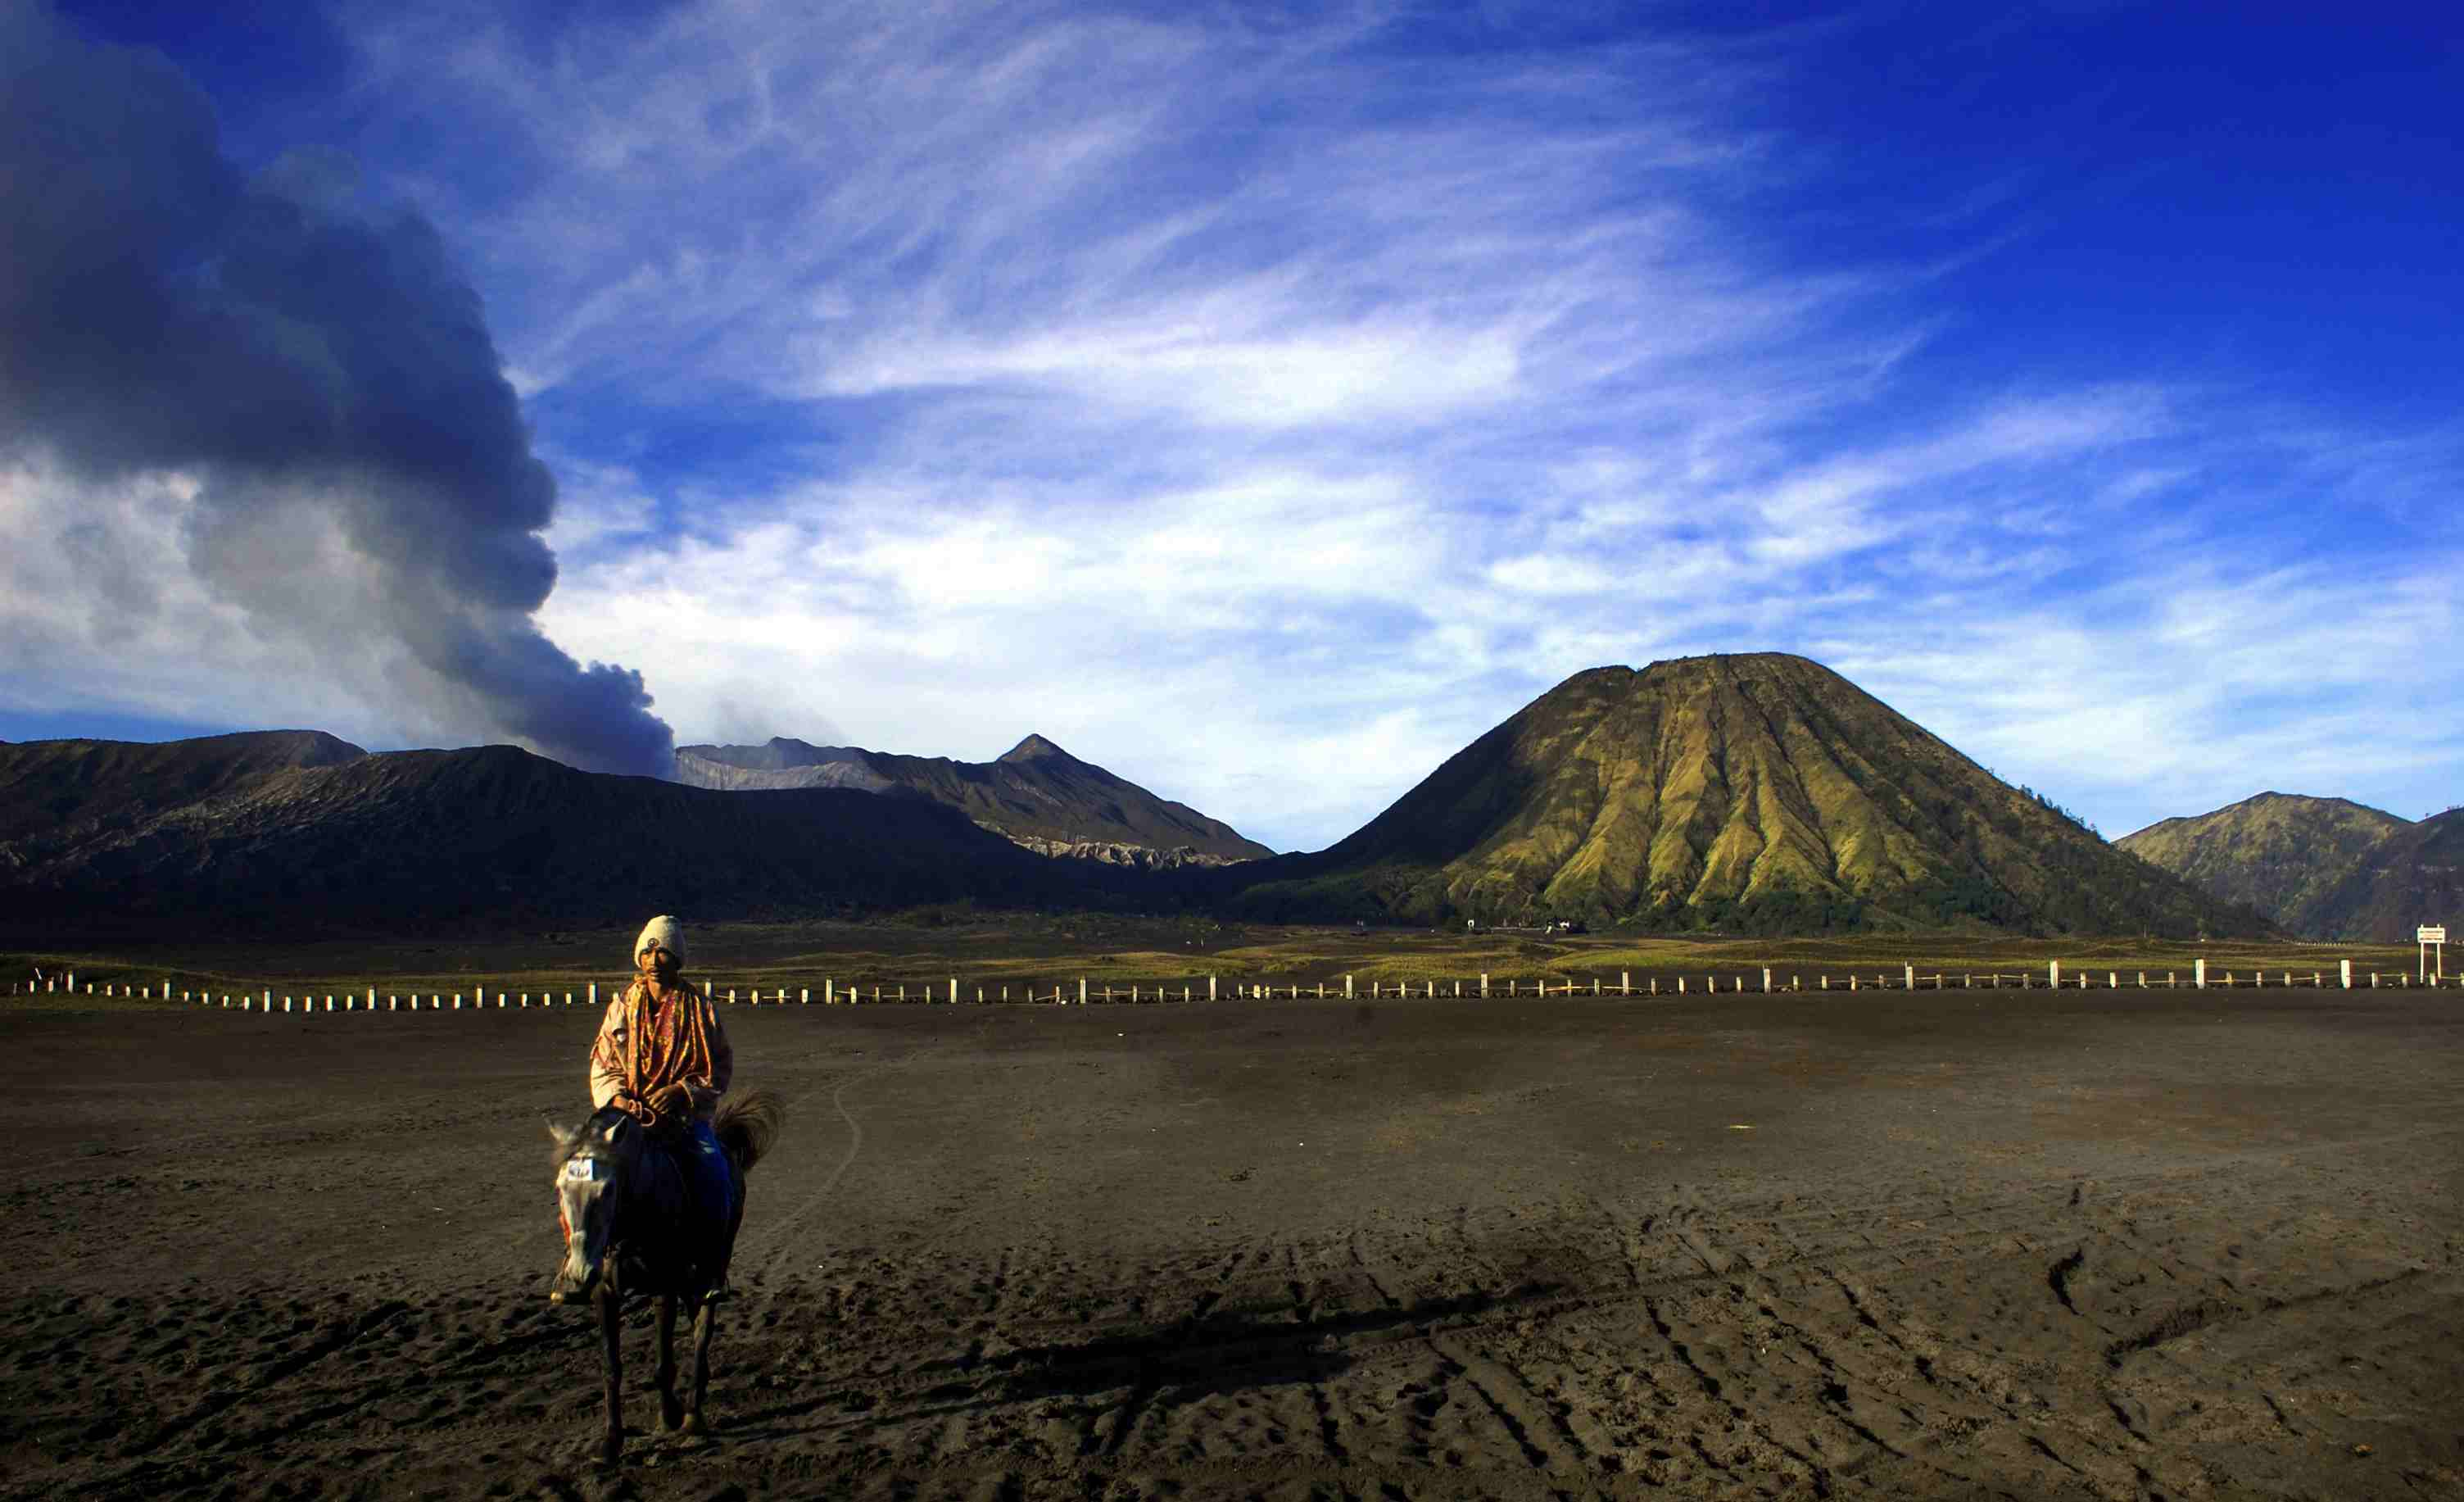 Yogyakarta Bromo Tour 2 Days 1 Night - Tour Package To Bromo From Jogja